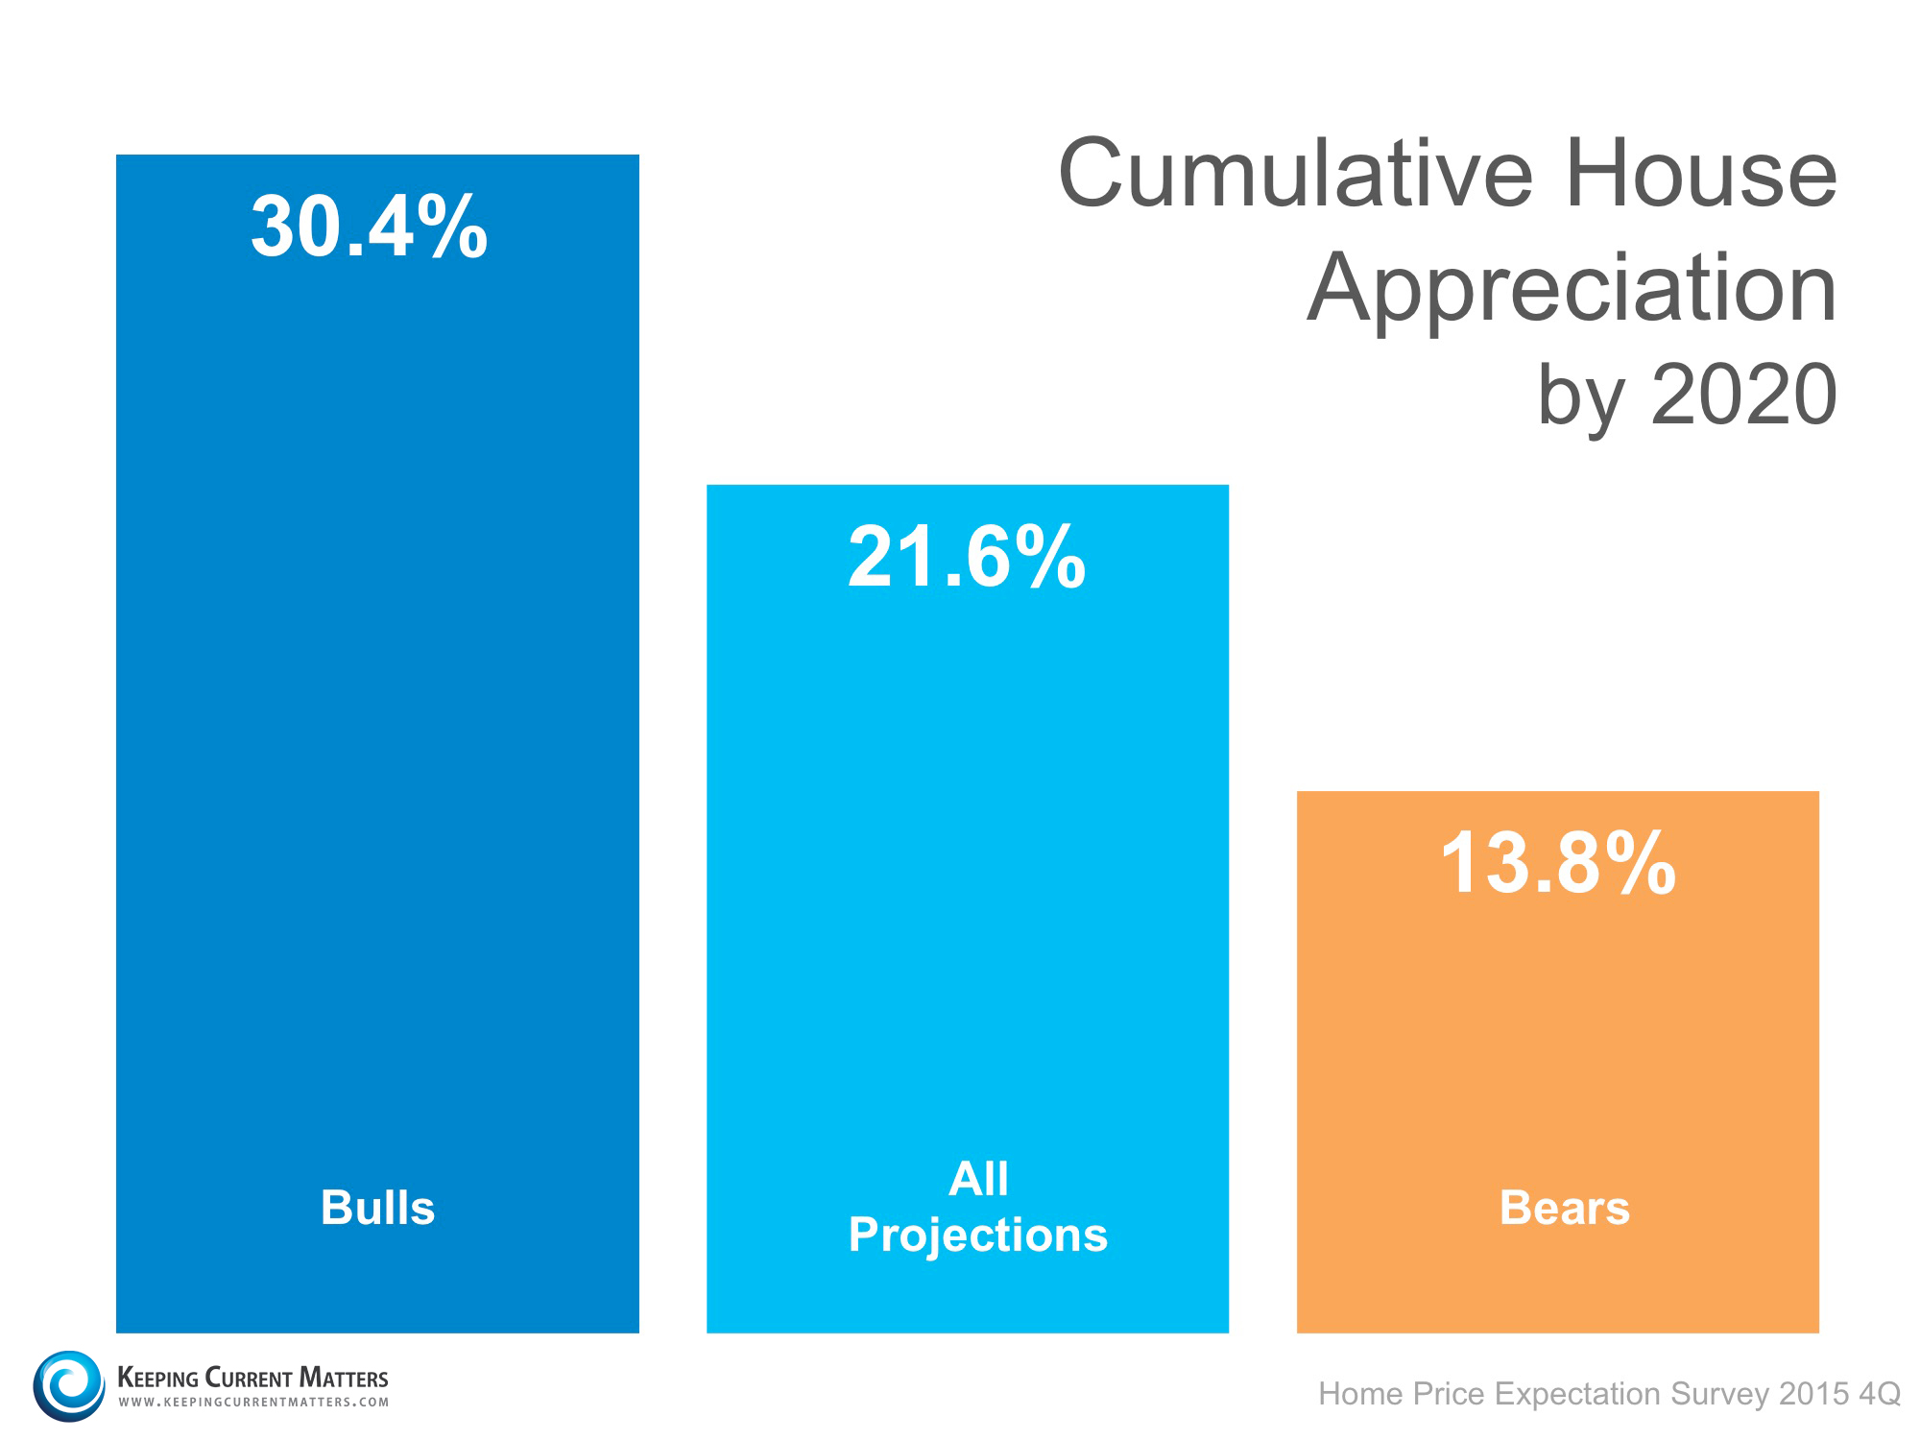 Cumulative House Appreciation | Keeping Current Matters